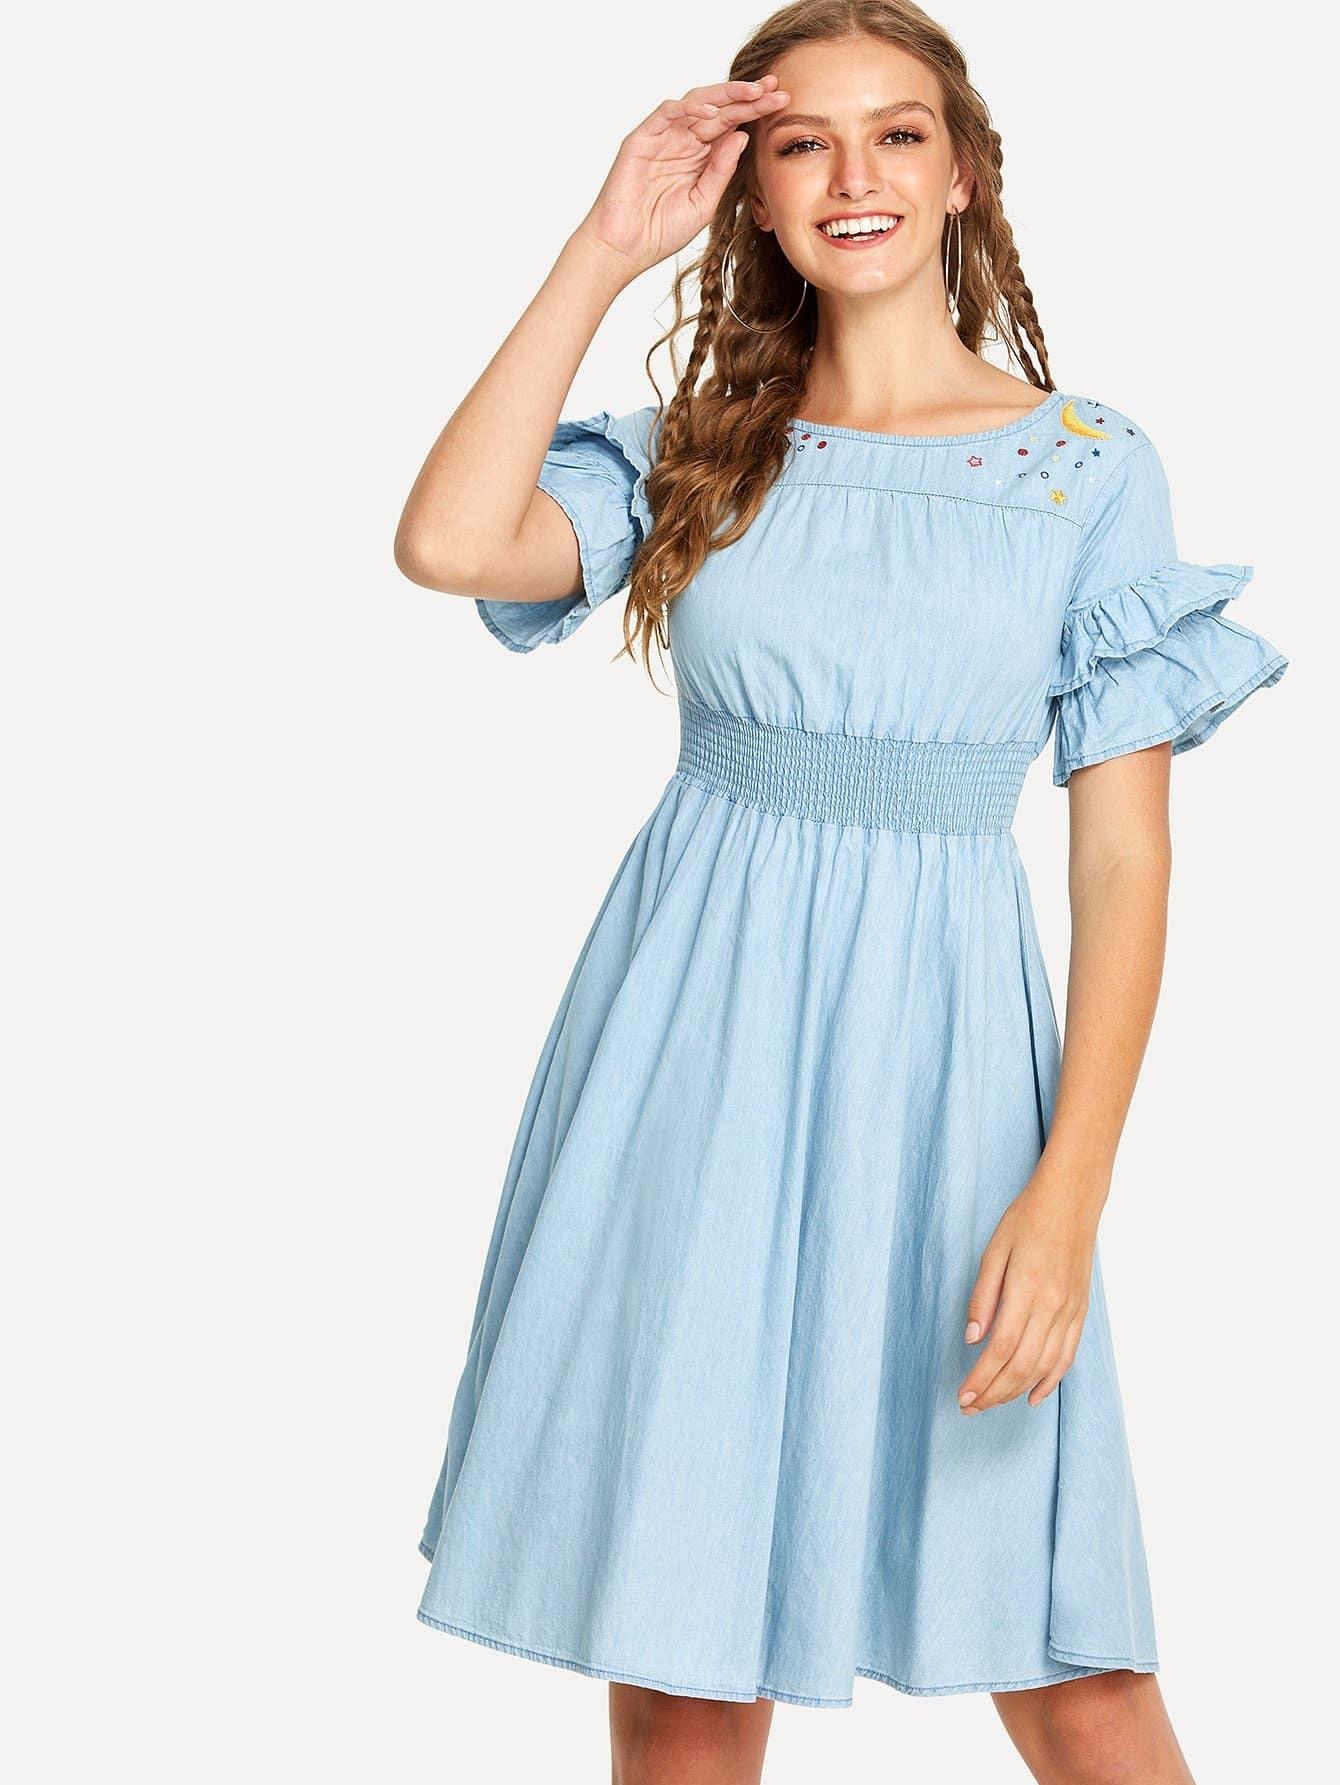 Flounce Sleeve Pleated Denim Dress flounce sleeve striped denim dress